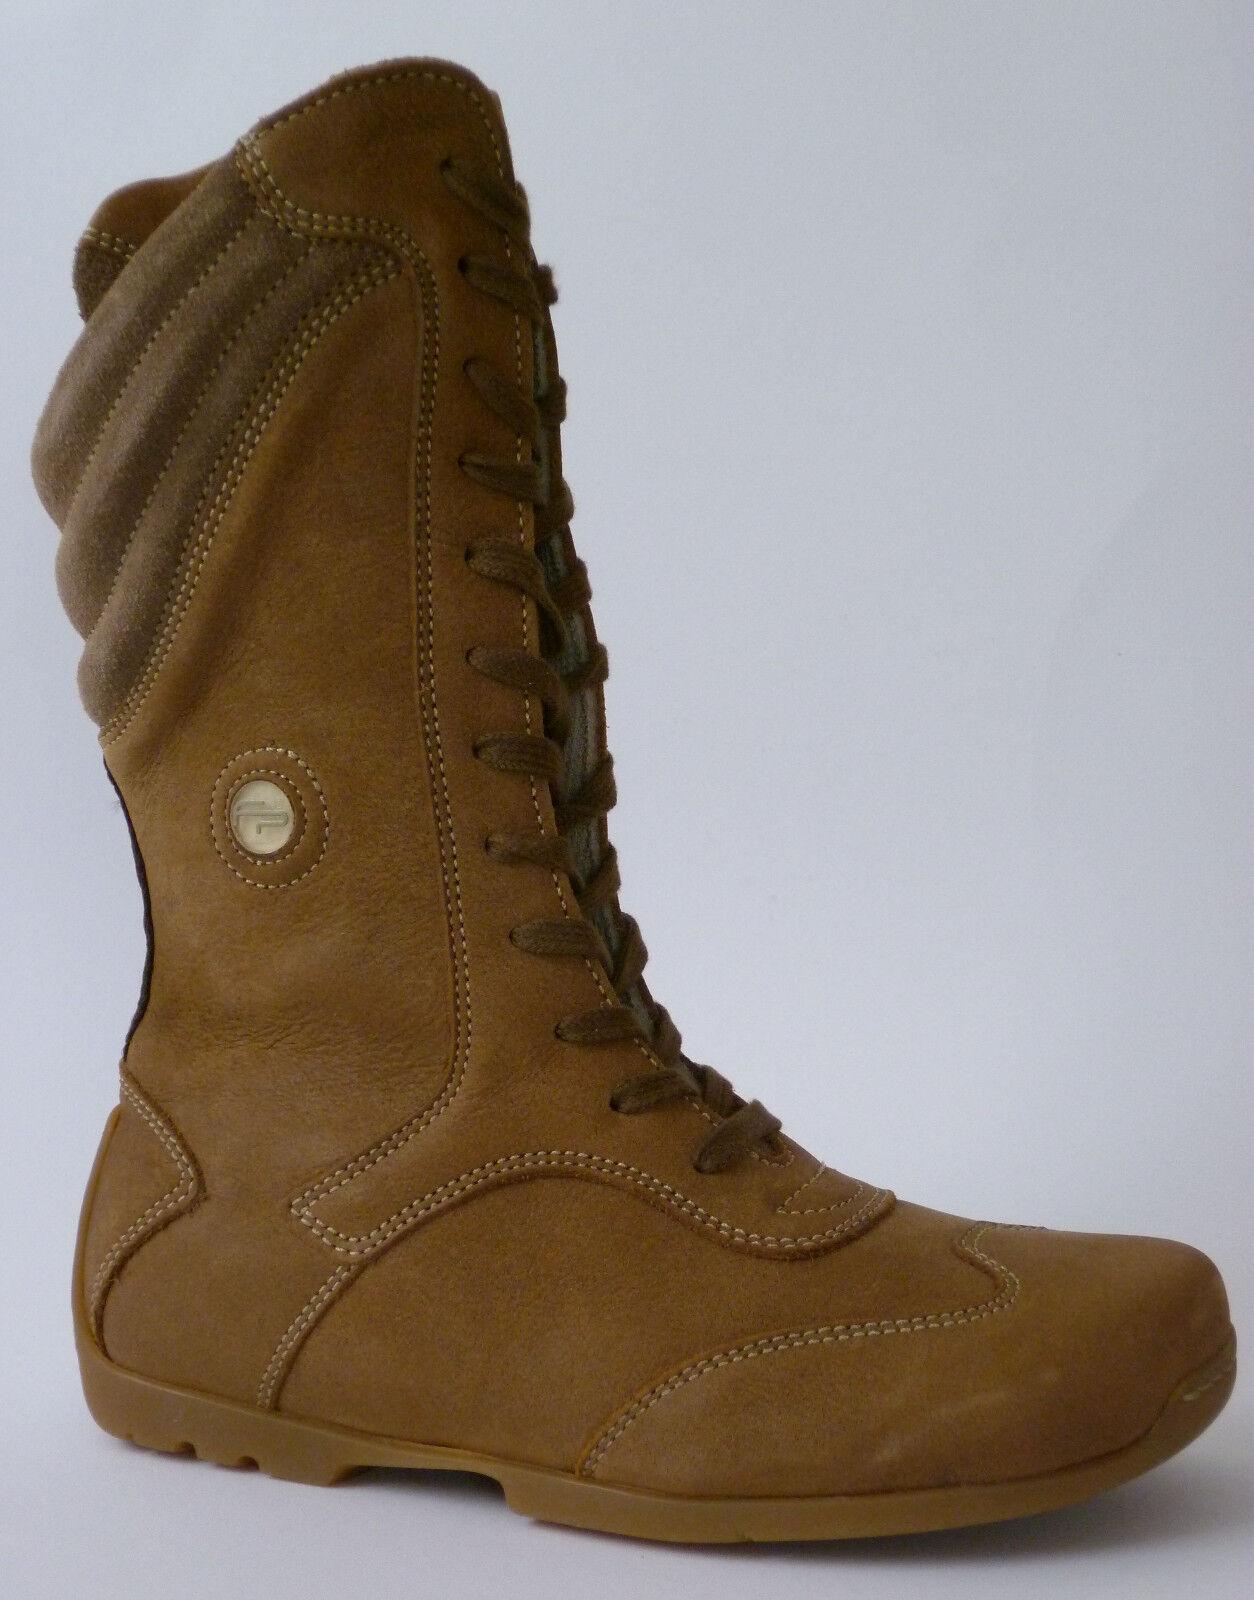 FOOTPRINTS MANCHESTER Birkenstock Stiefel FB 36 Leder Stiefel Birkenstock Normal NEU b615ef